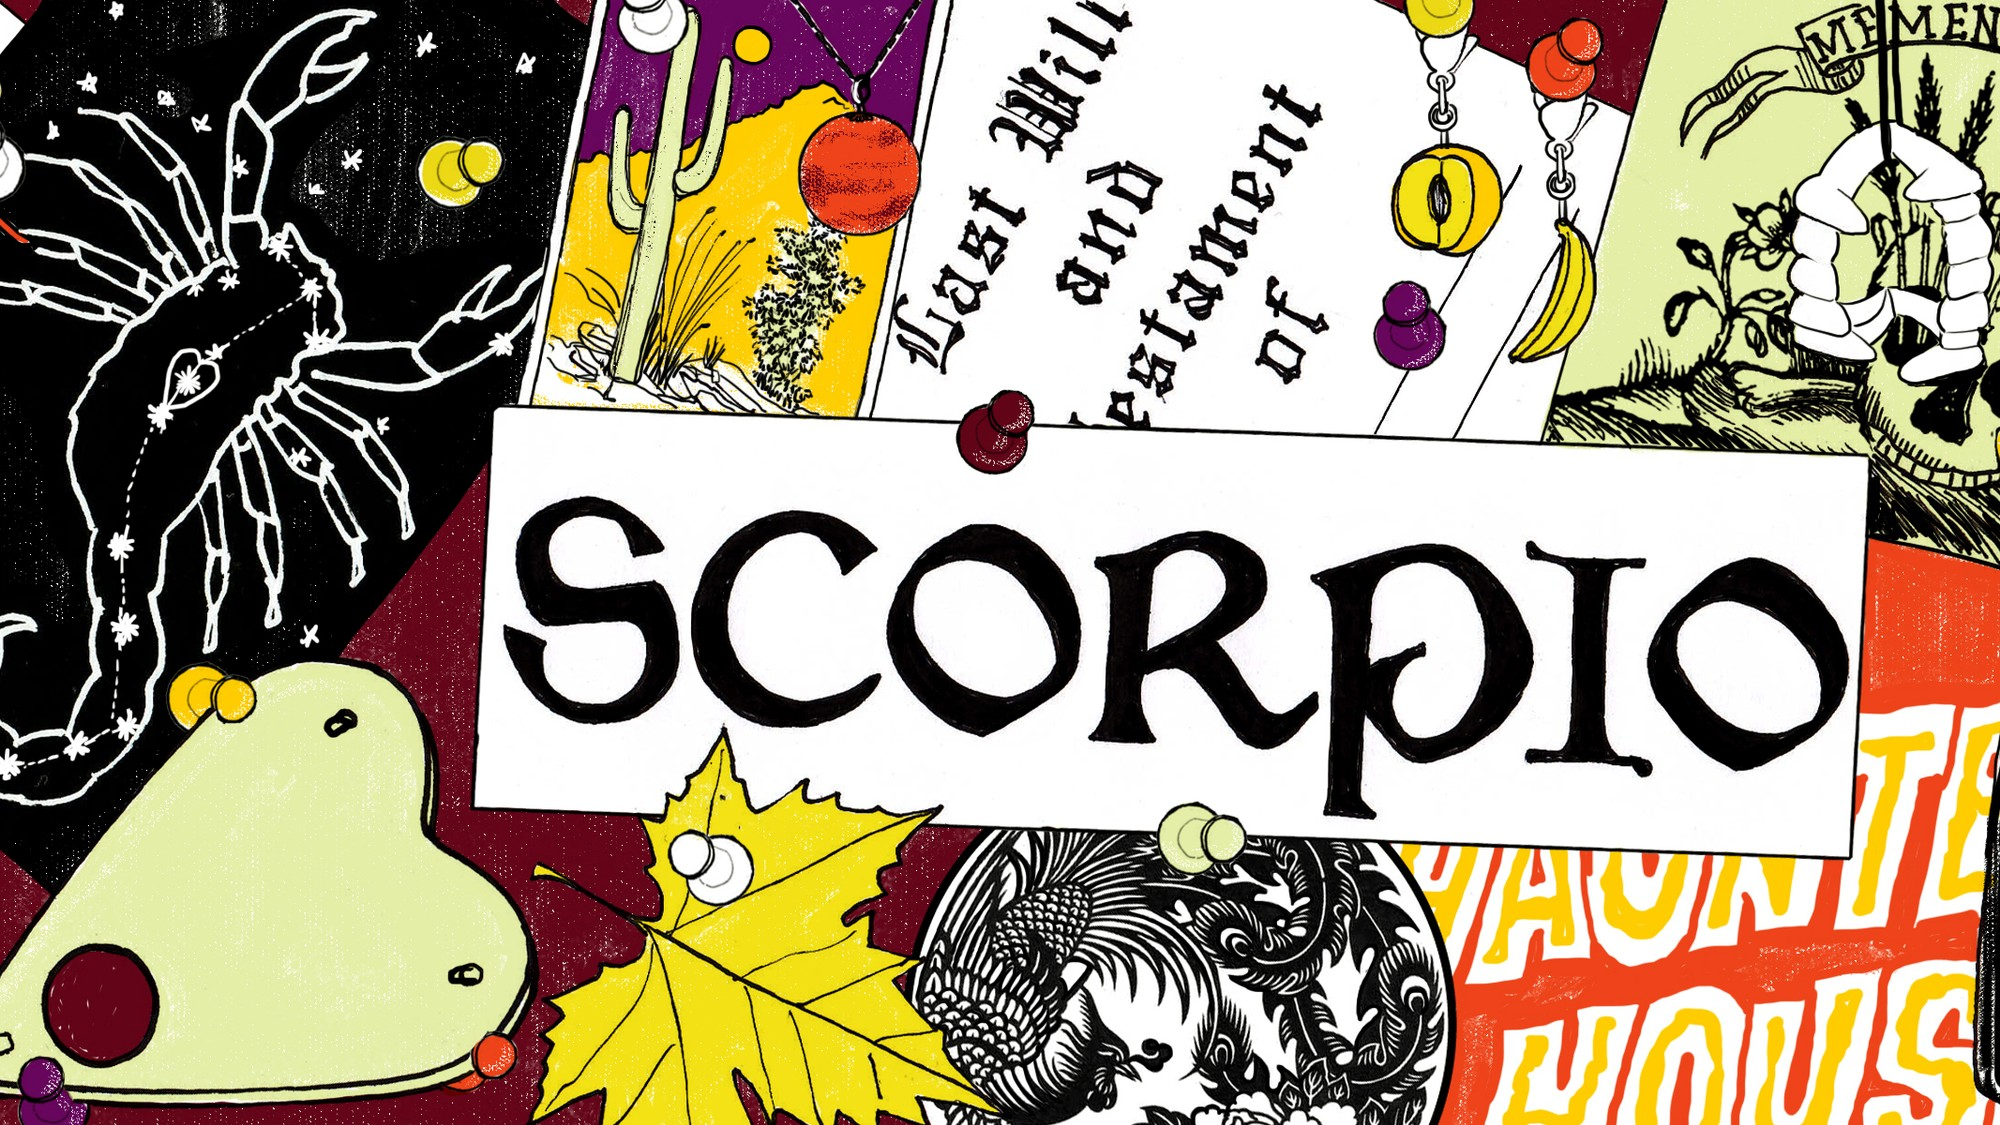 Monthly Horoscope: Scorpio, March 2019 - VICE